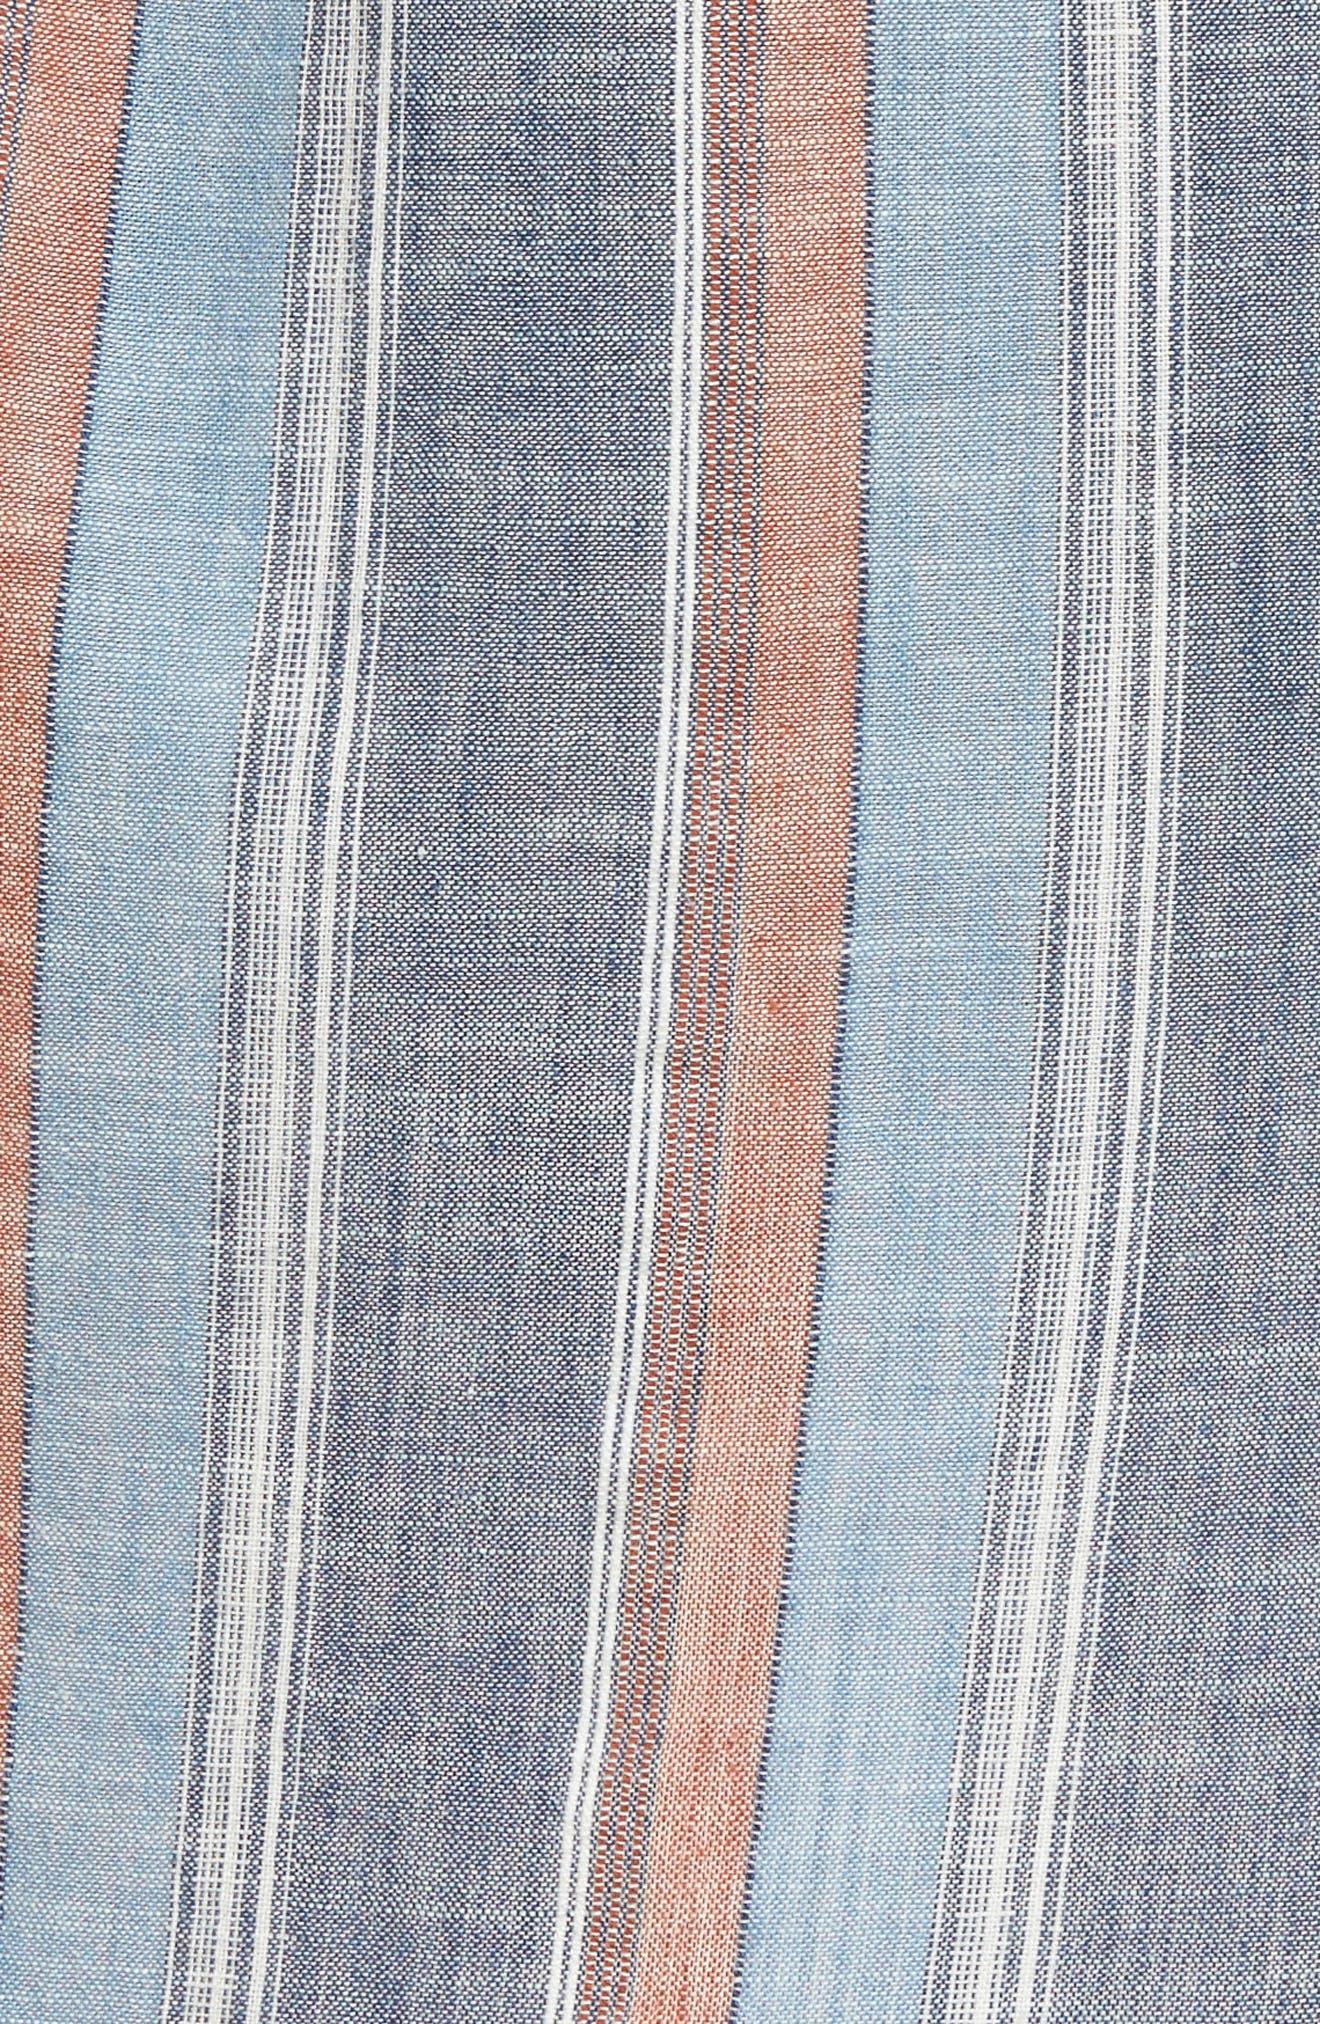 Anna Henley Dress,                             Alternate thumbnail 5, color,                             Blue Fig Multi